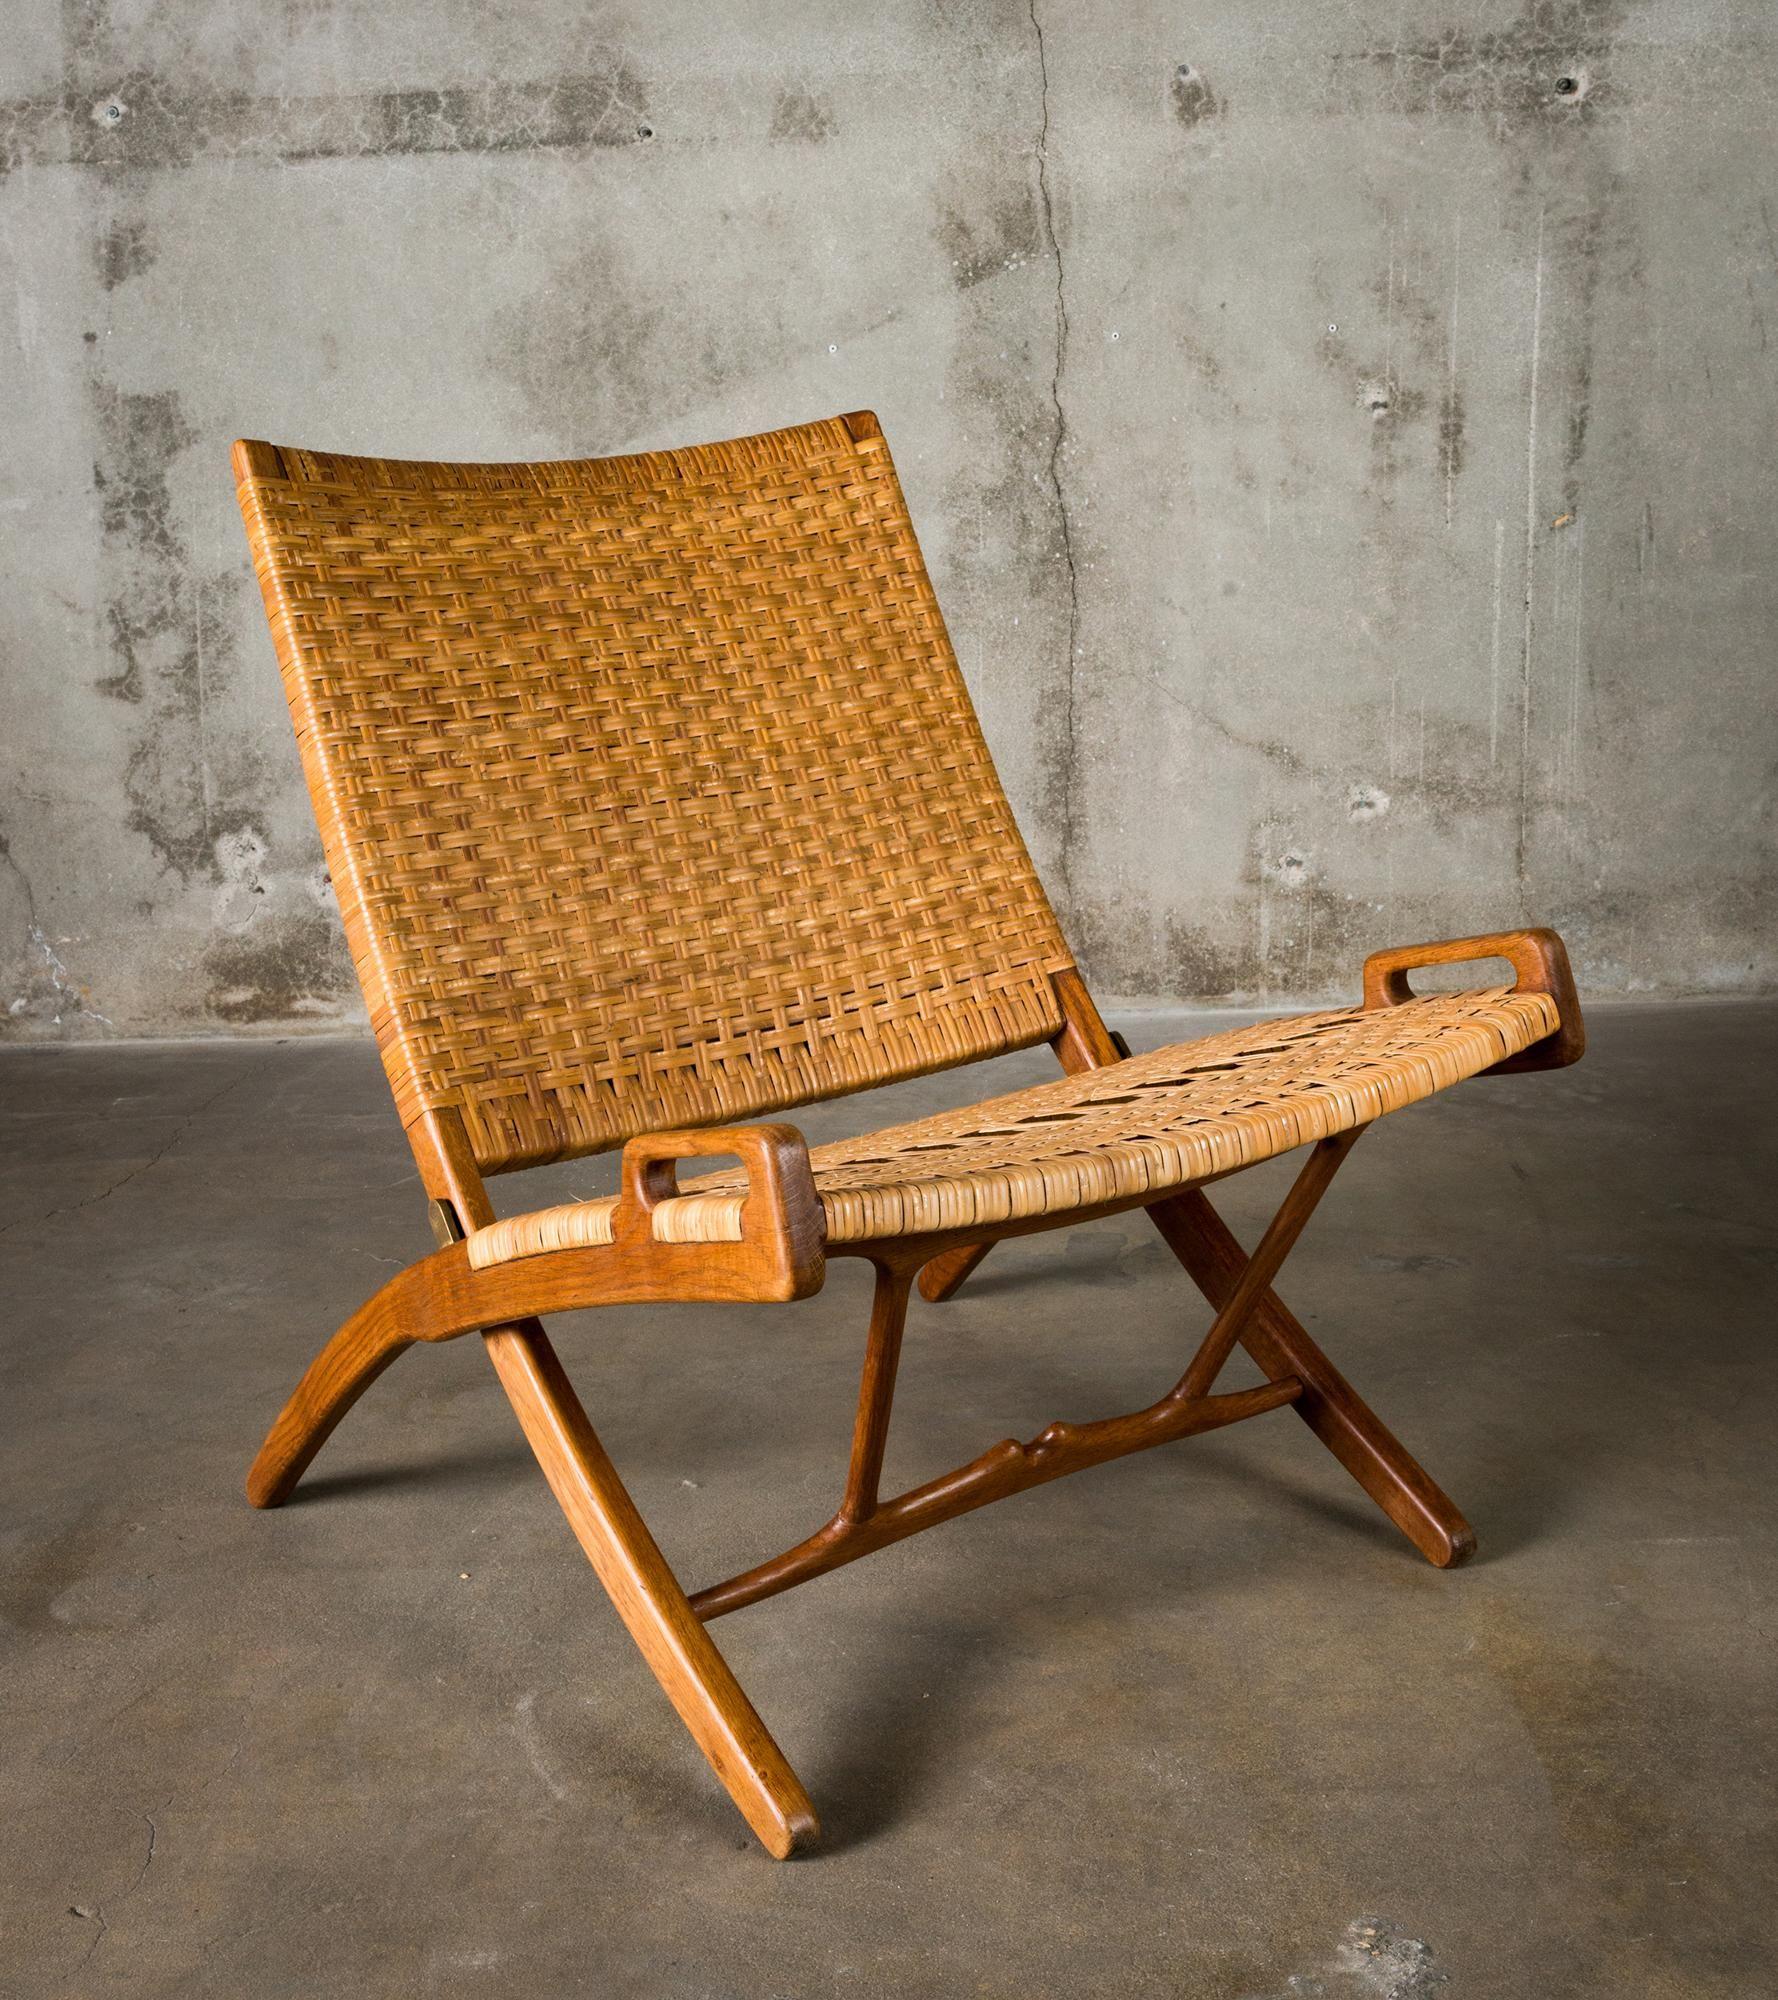 Hans Wegner Folding Chair For Sale At 1stdibs Chair Folding